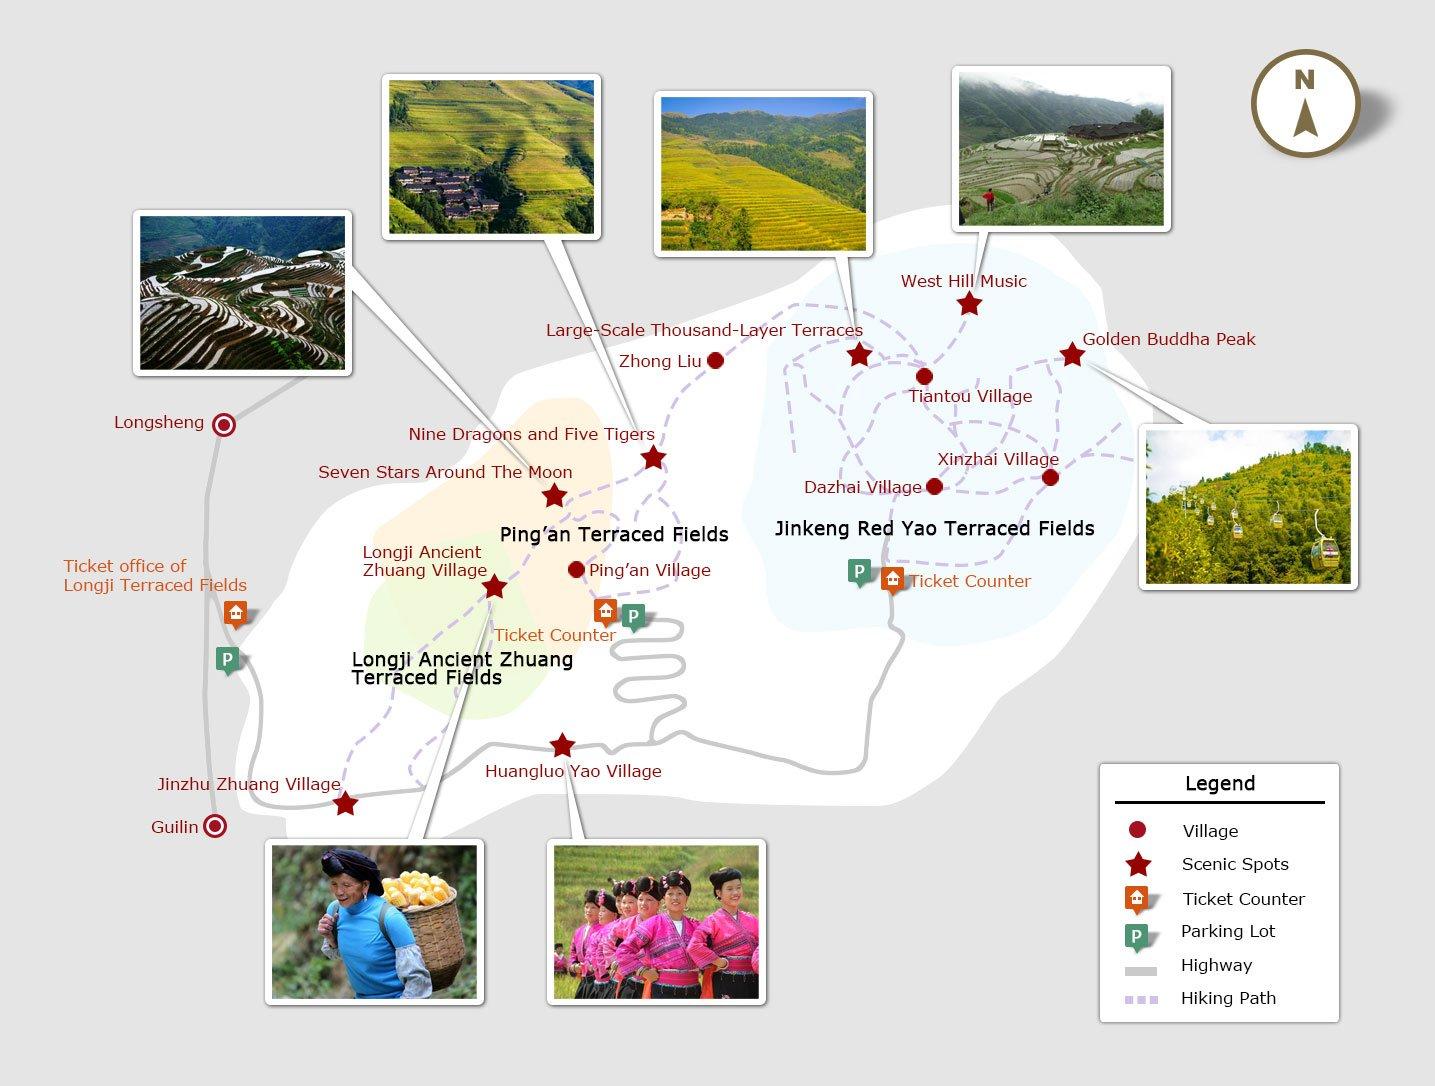 The Longji Rice Terraced Fields Get Travel Tips From